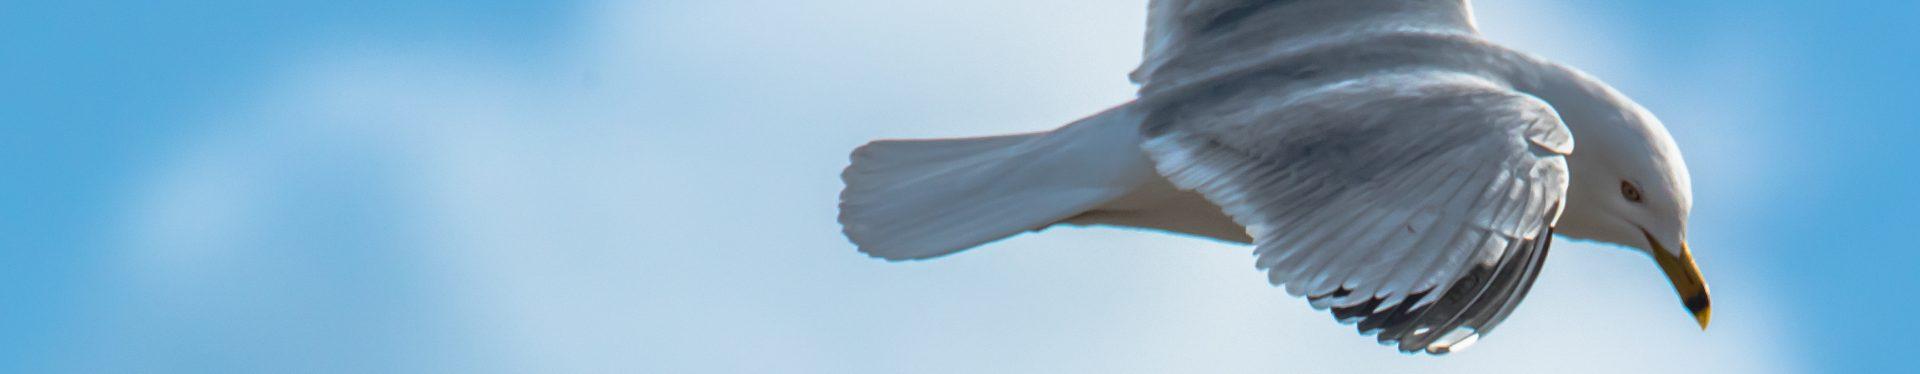 bird picture.